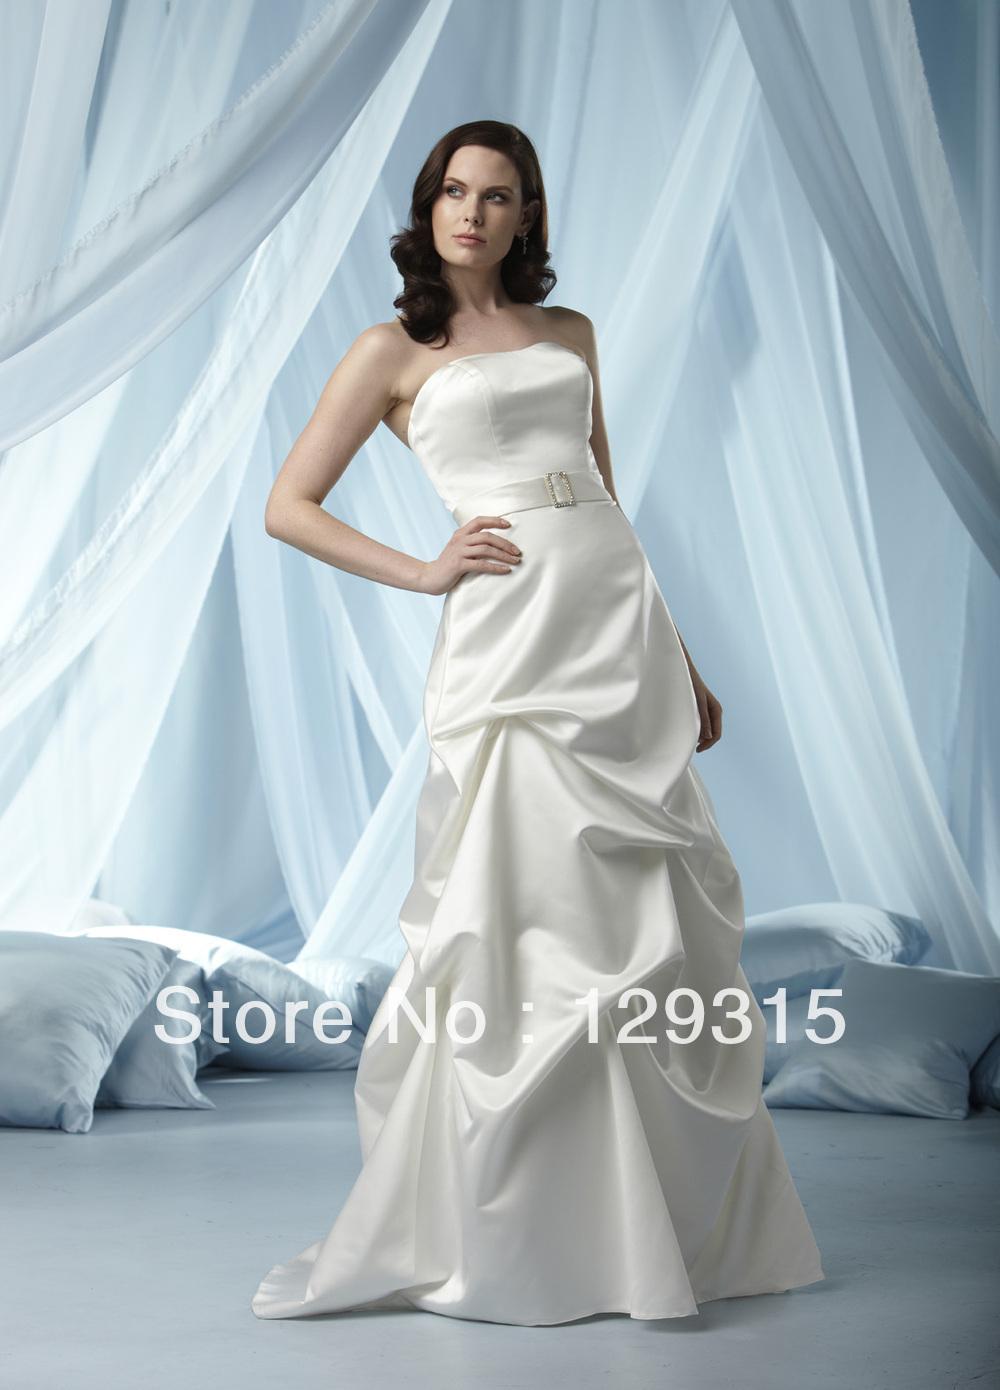 Fashionable wedding dresses 2010 homecoming hairstyles navy blue dress 201211082736(China (Mainland))